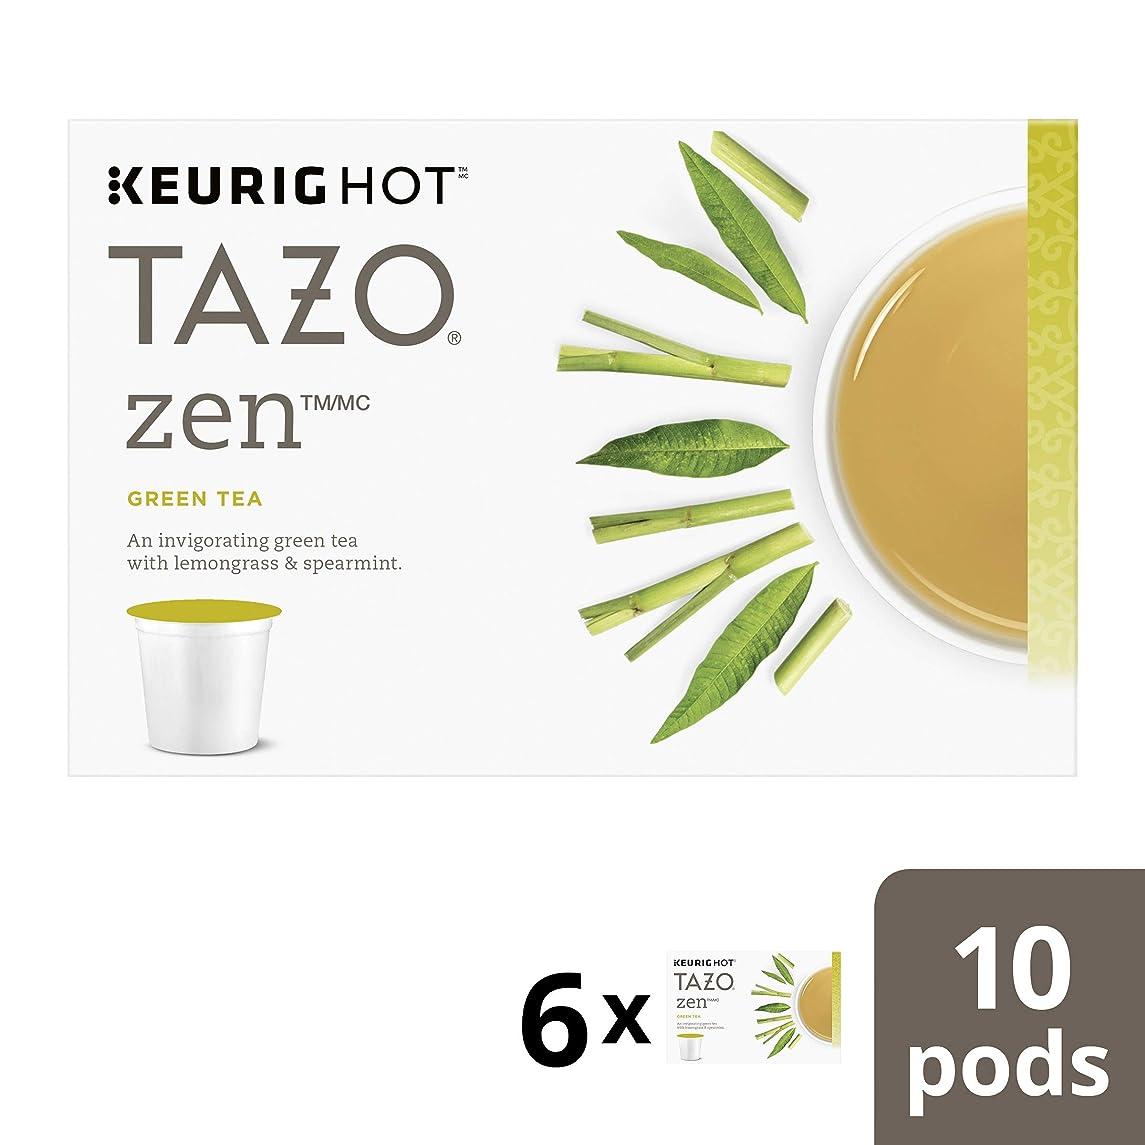 Tazo Zen Green Tea, K-Cups, 10ct